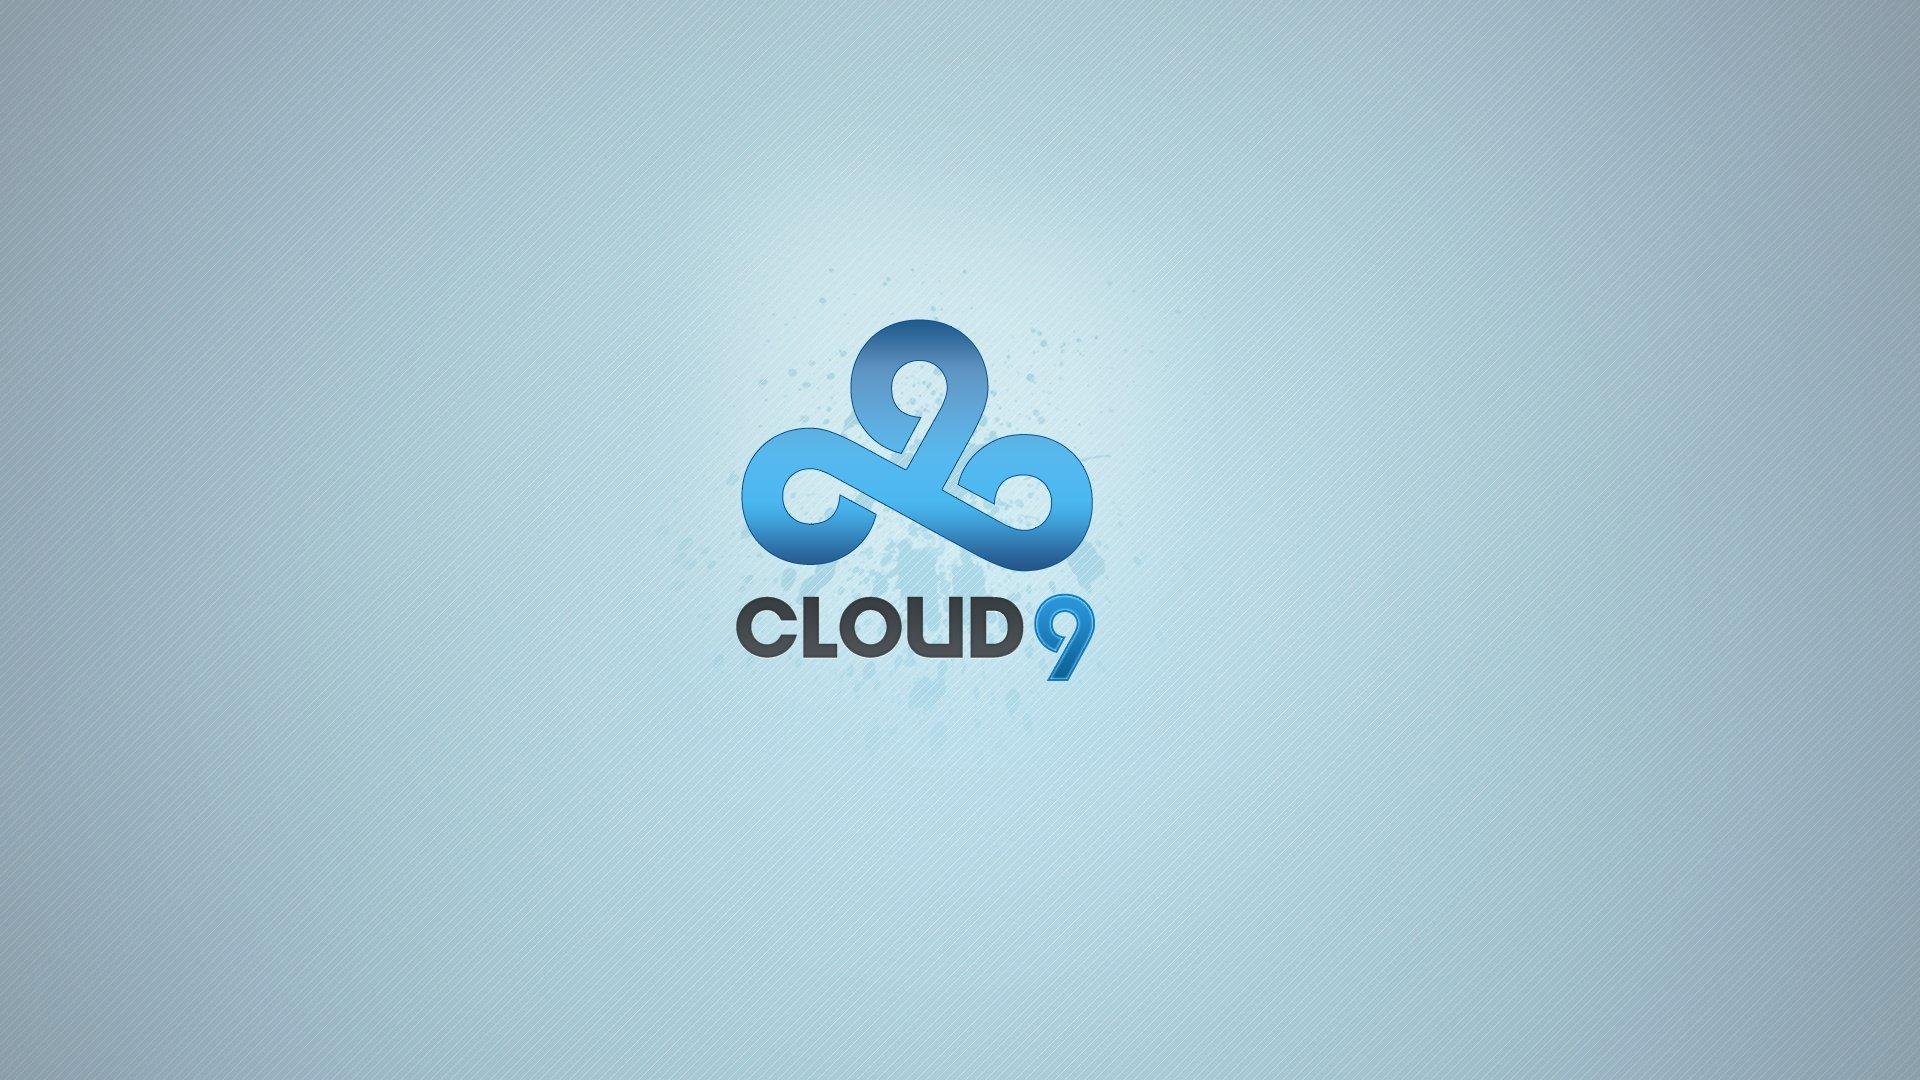 c9_cloud_nine